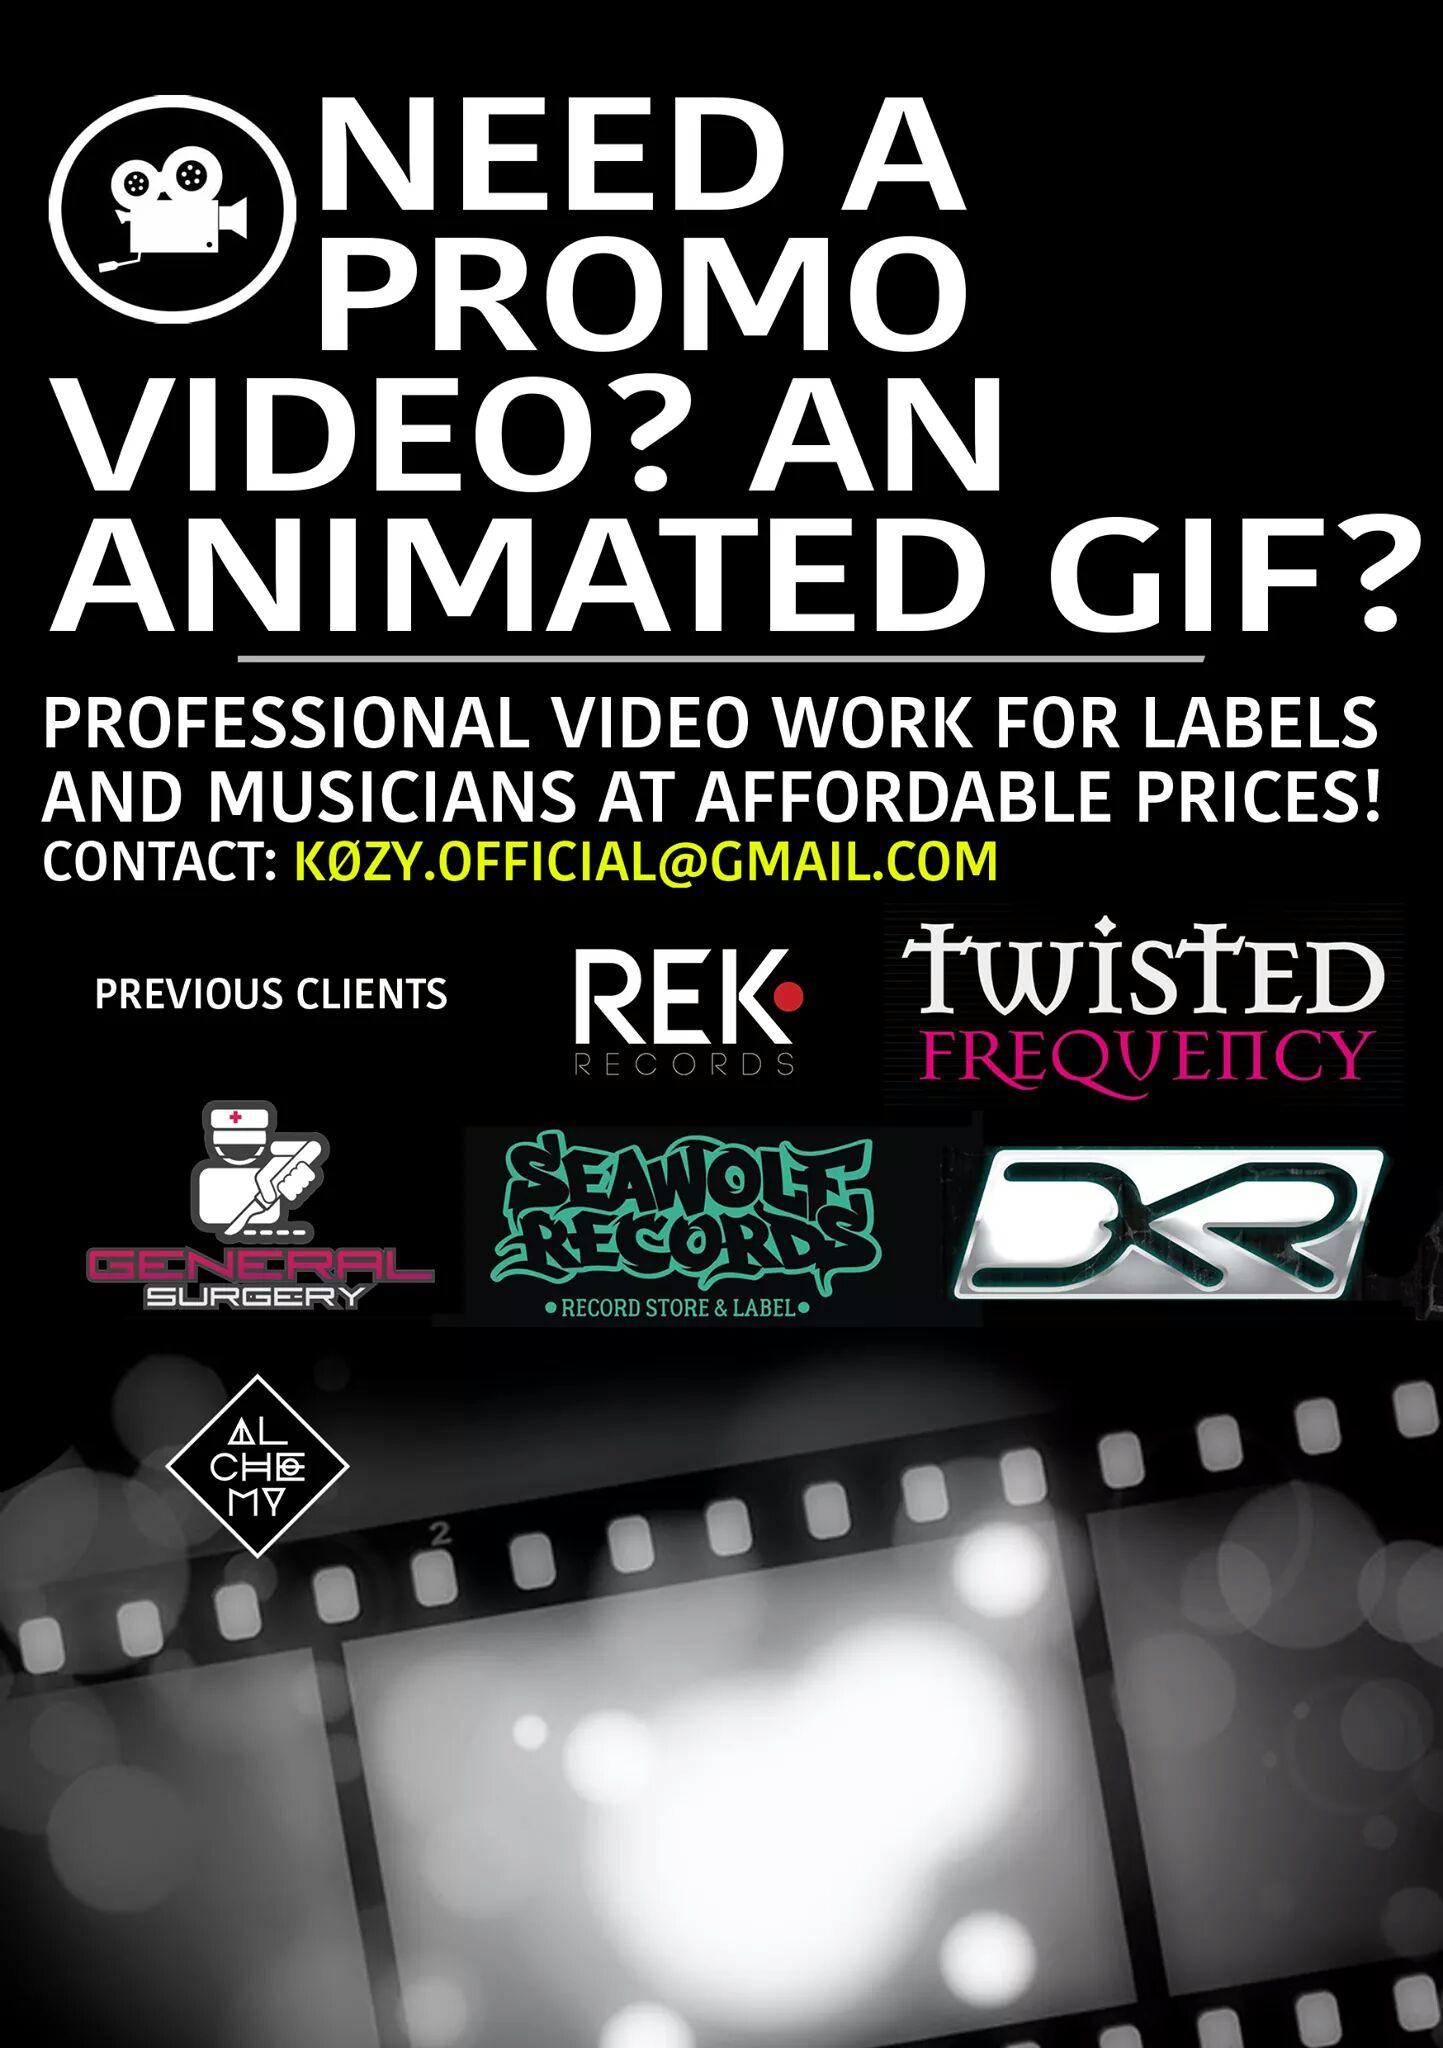 Got A Track? Want An Industry Standard Video?